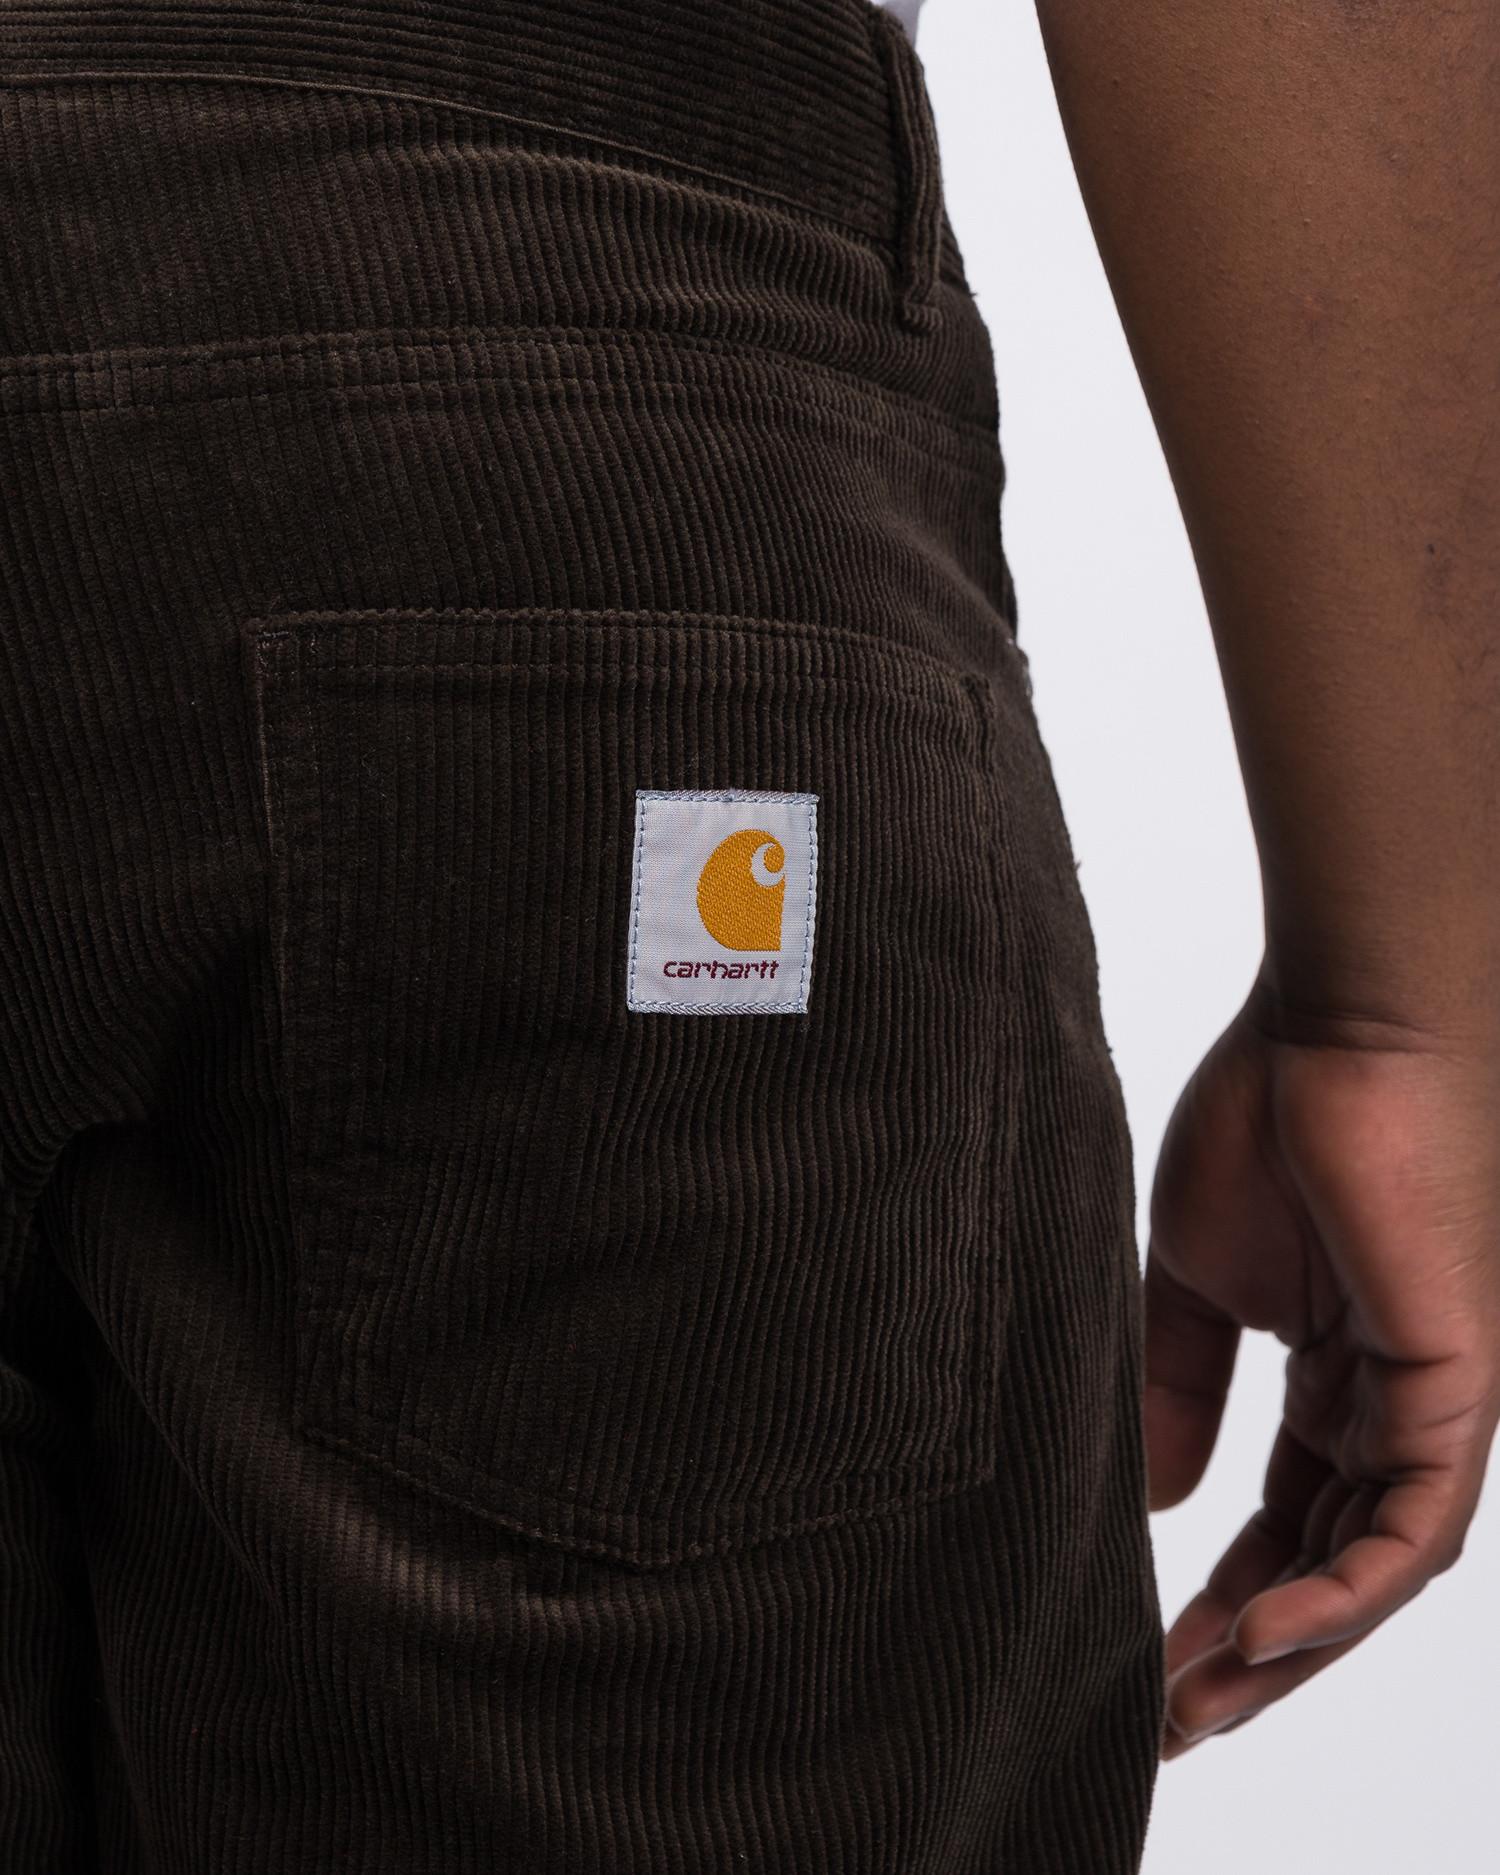 Carhartt Newel Pant Tobacco Rinsed